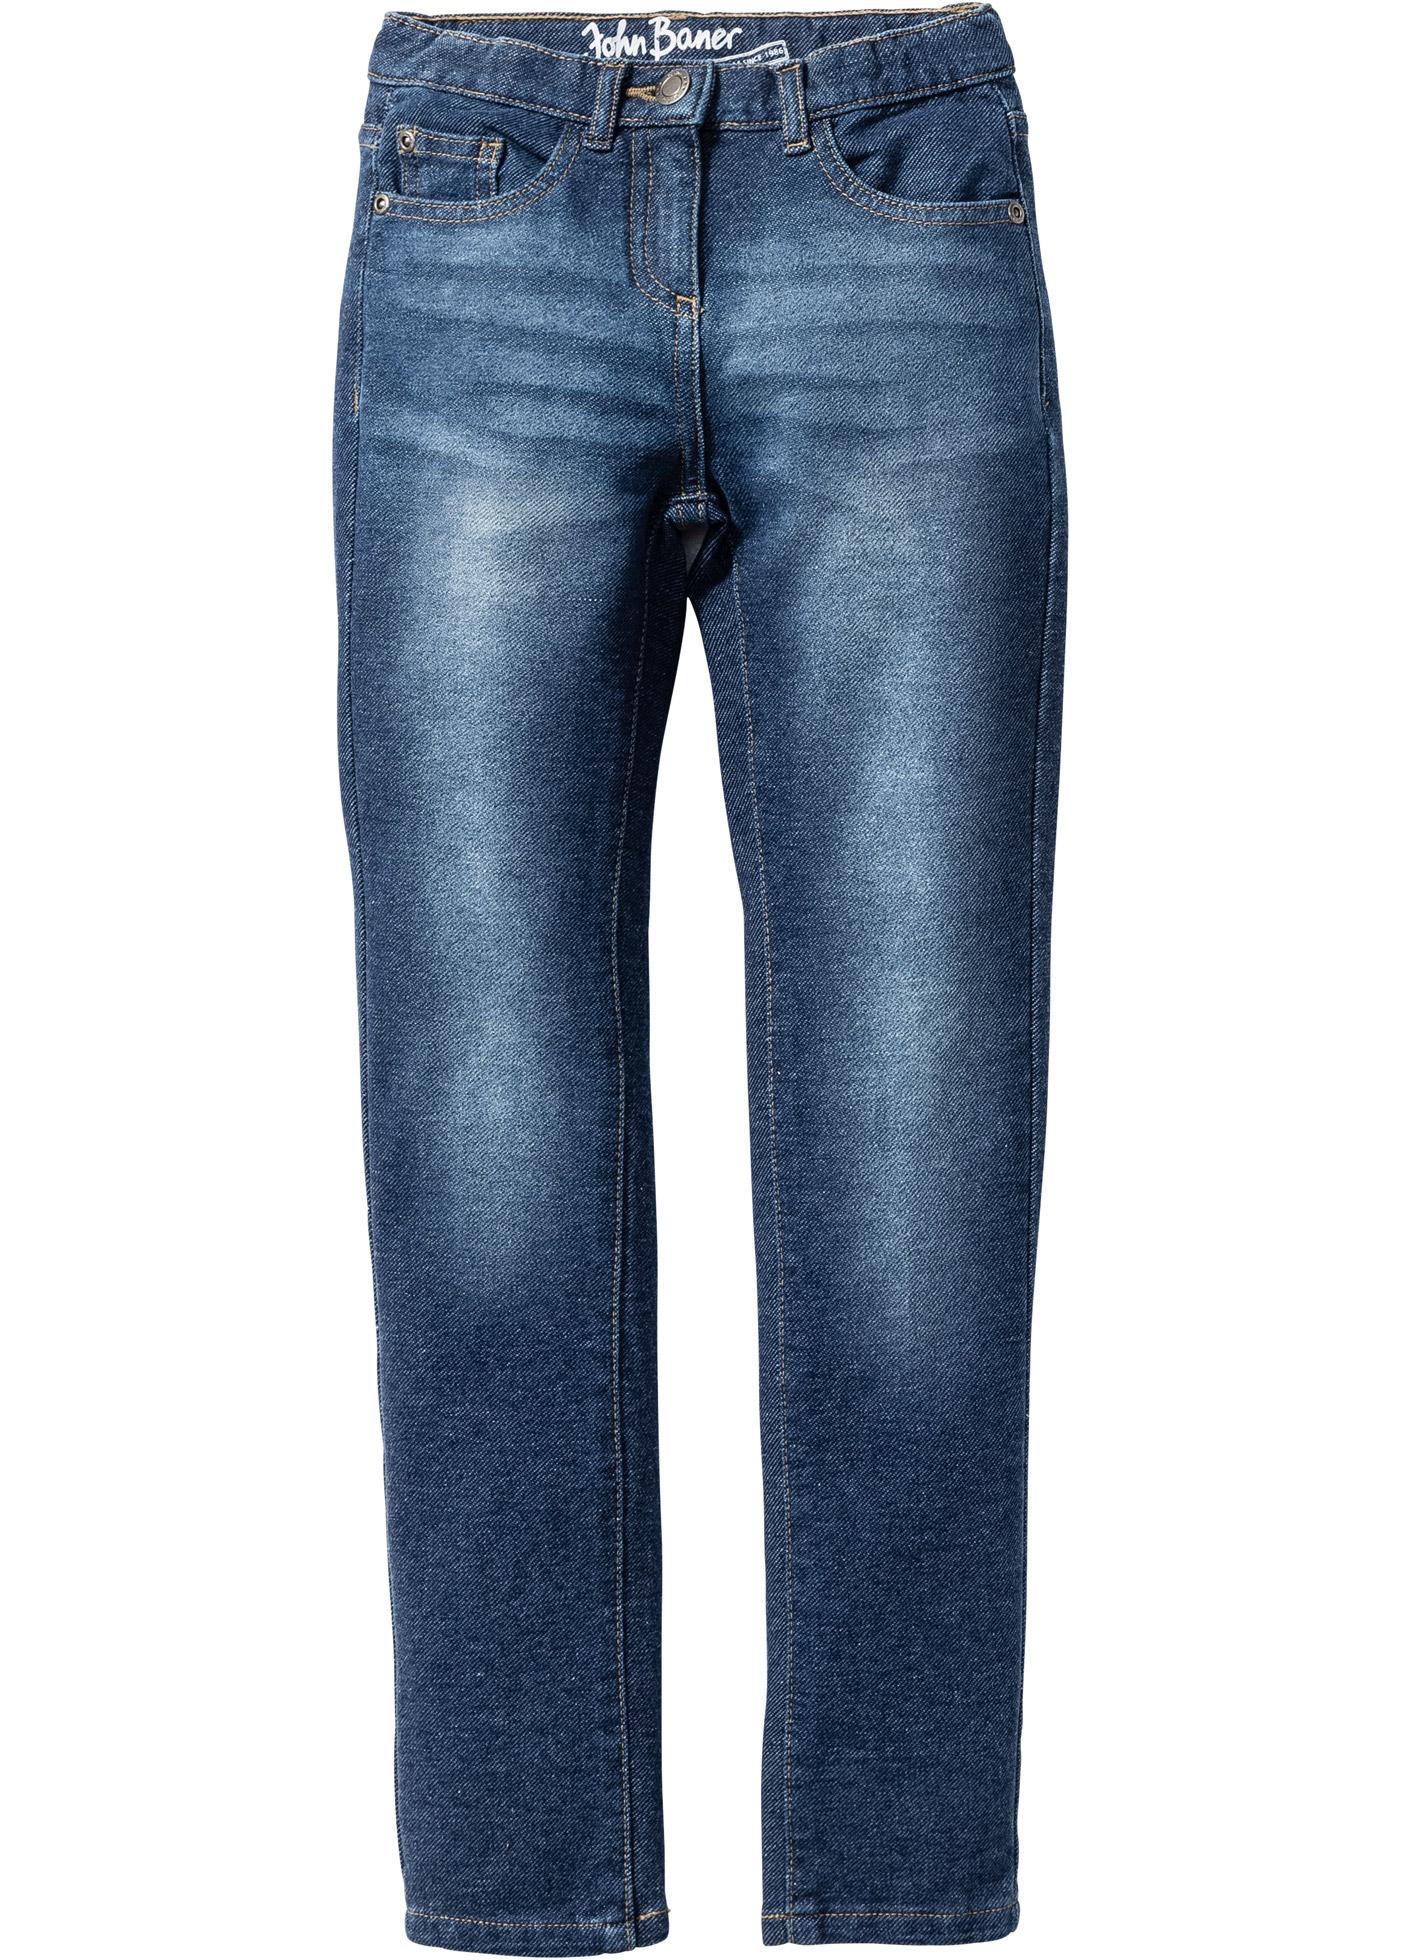 Kinder Jeans Hose Skinny Soft Denim Jungen Freizeit Slim blau Größe ... 7491cd735c